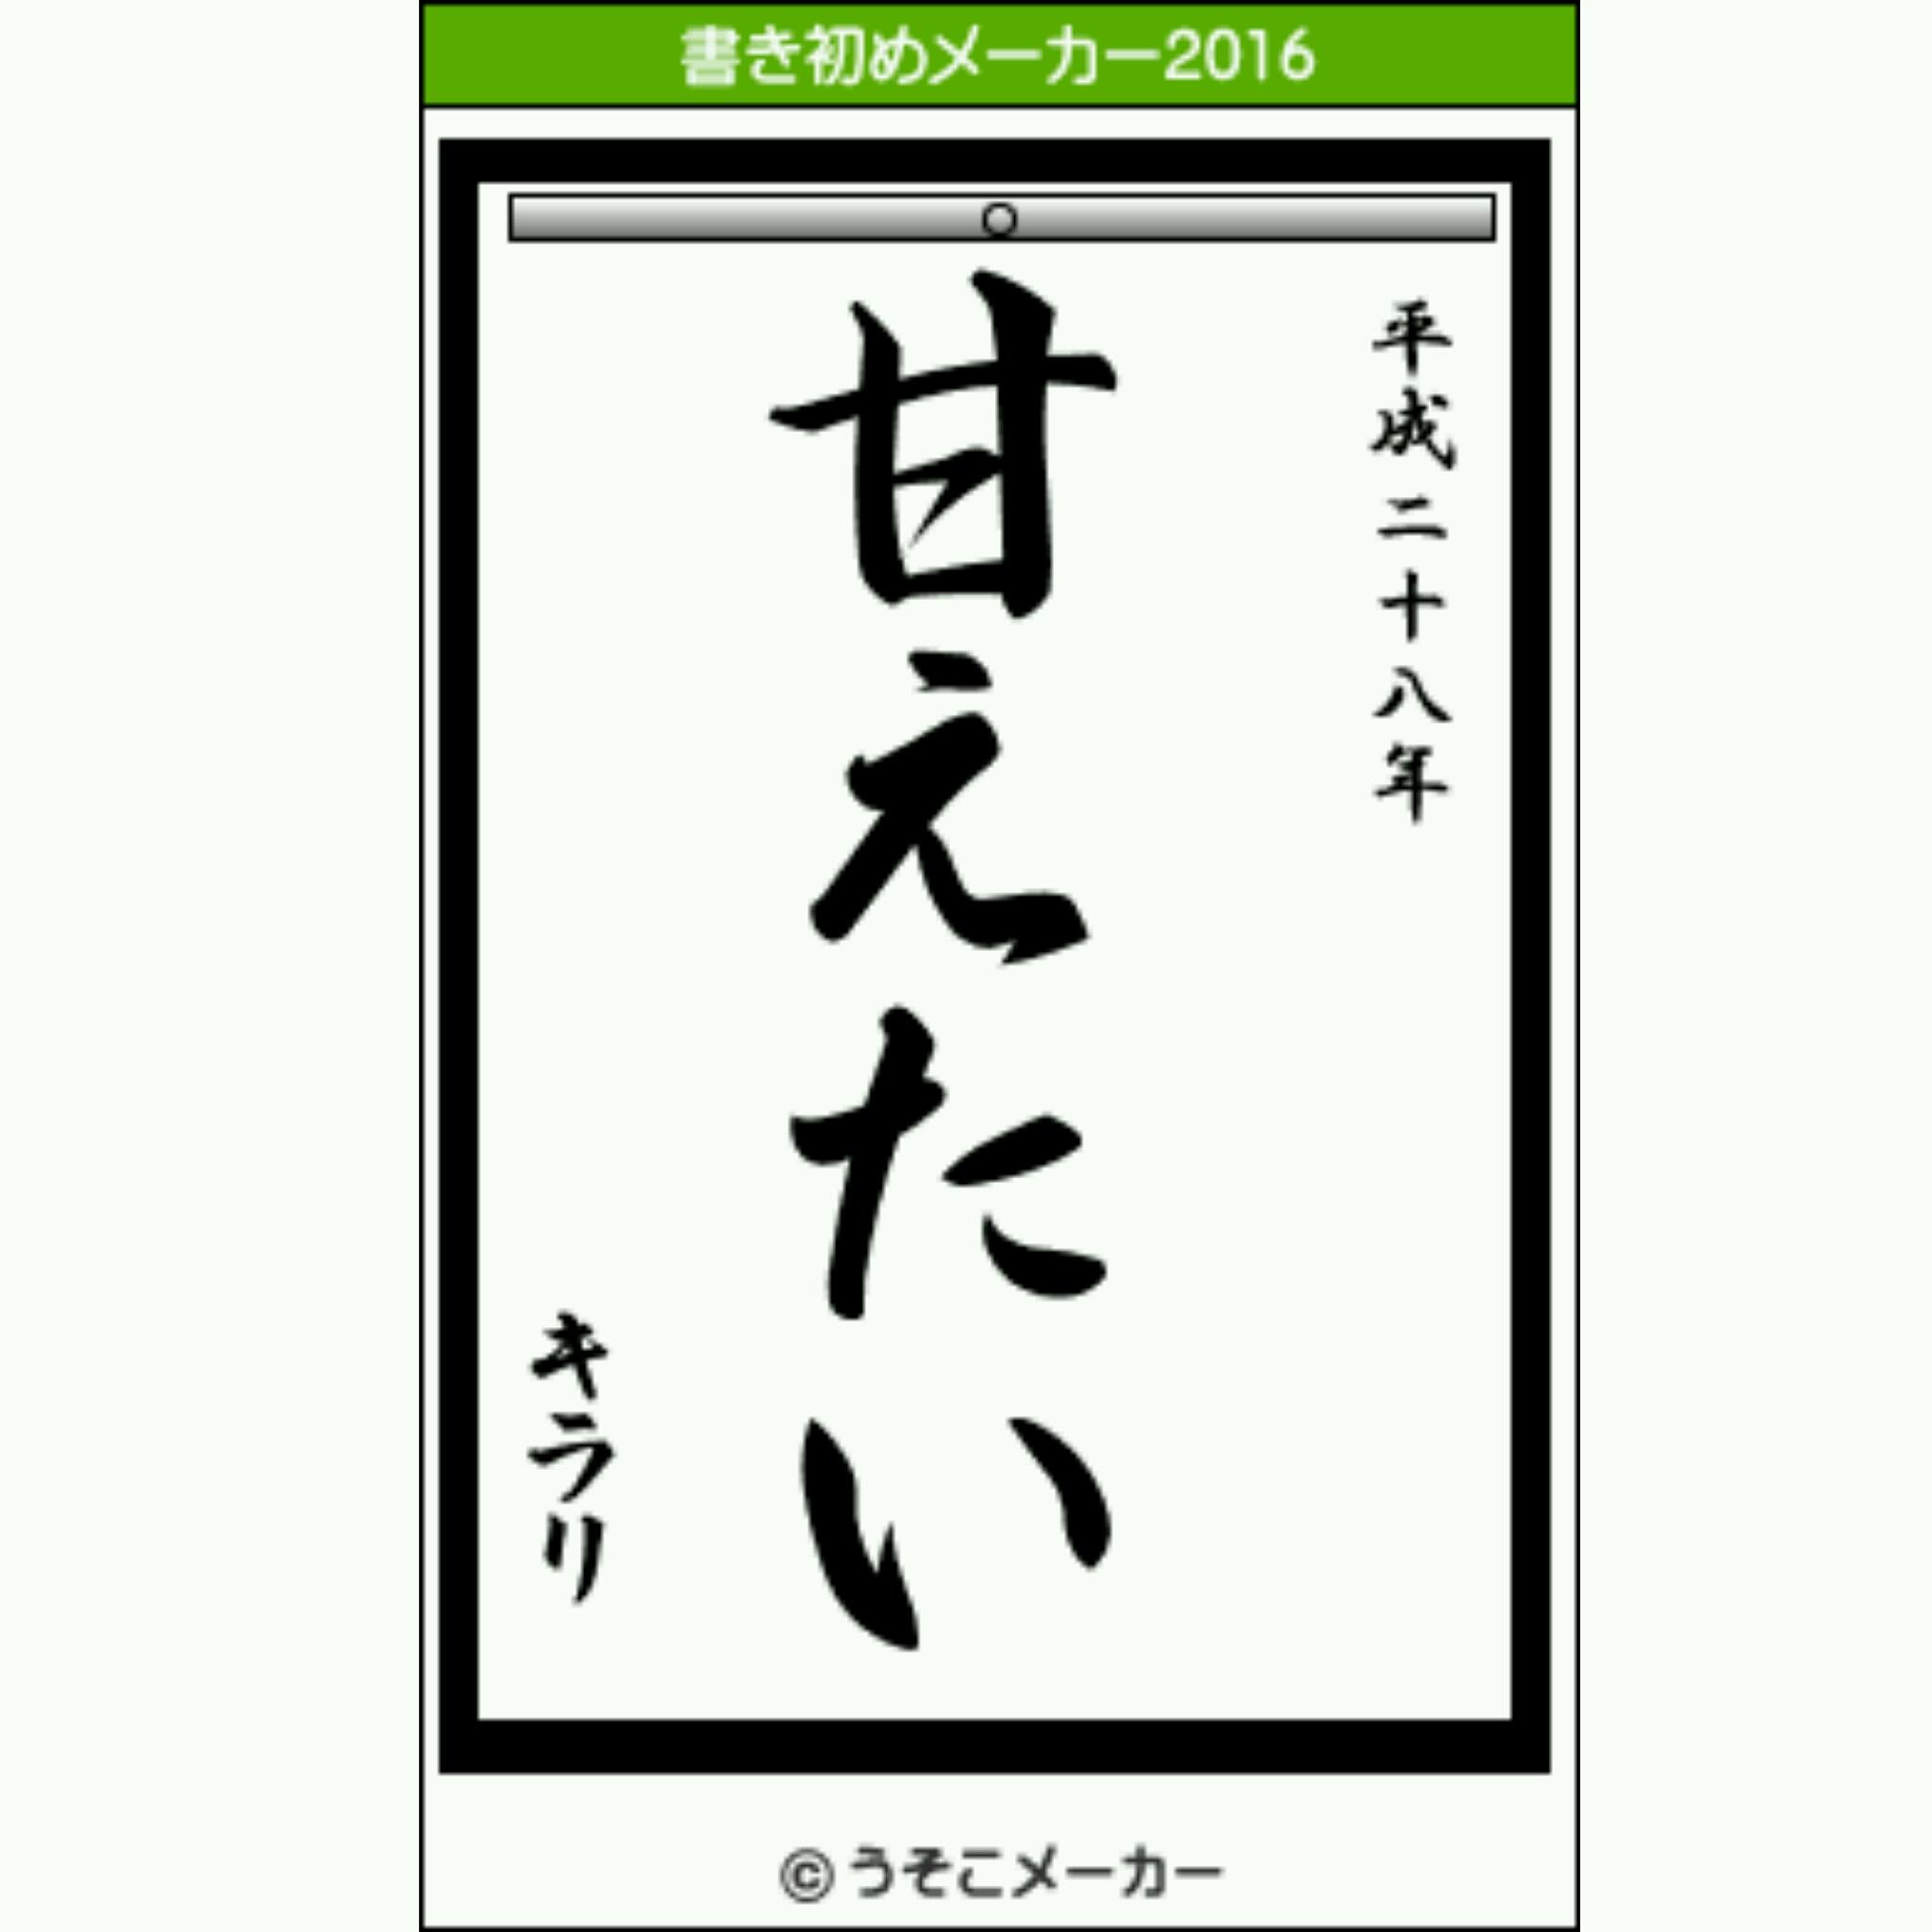 20160203215249e9c.jpg